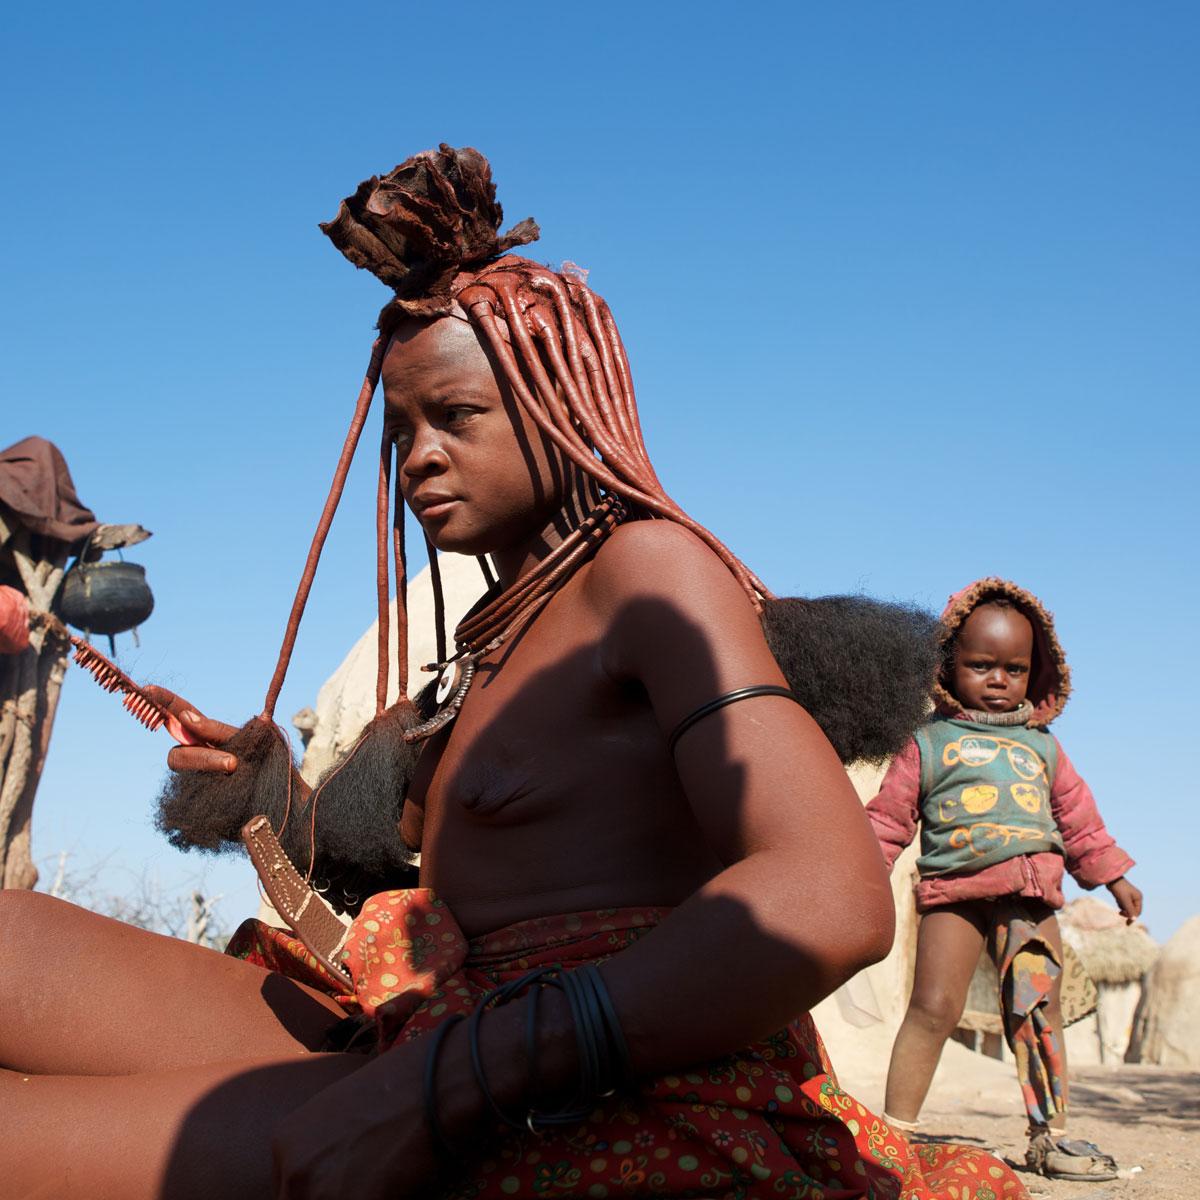 namibia_039_SP